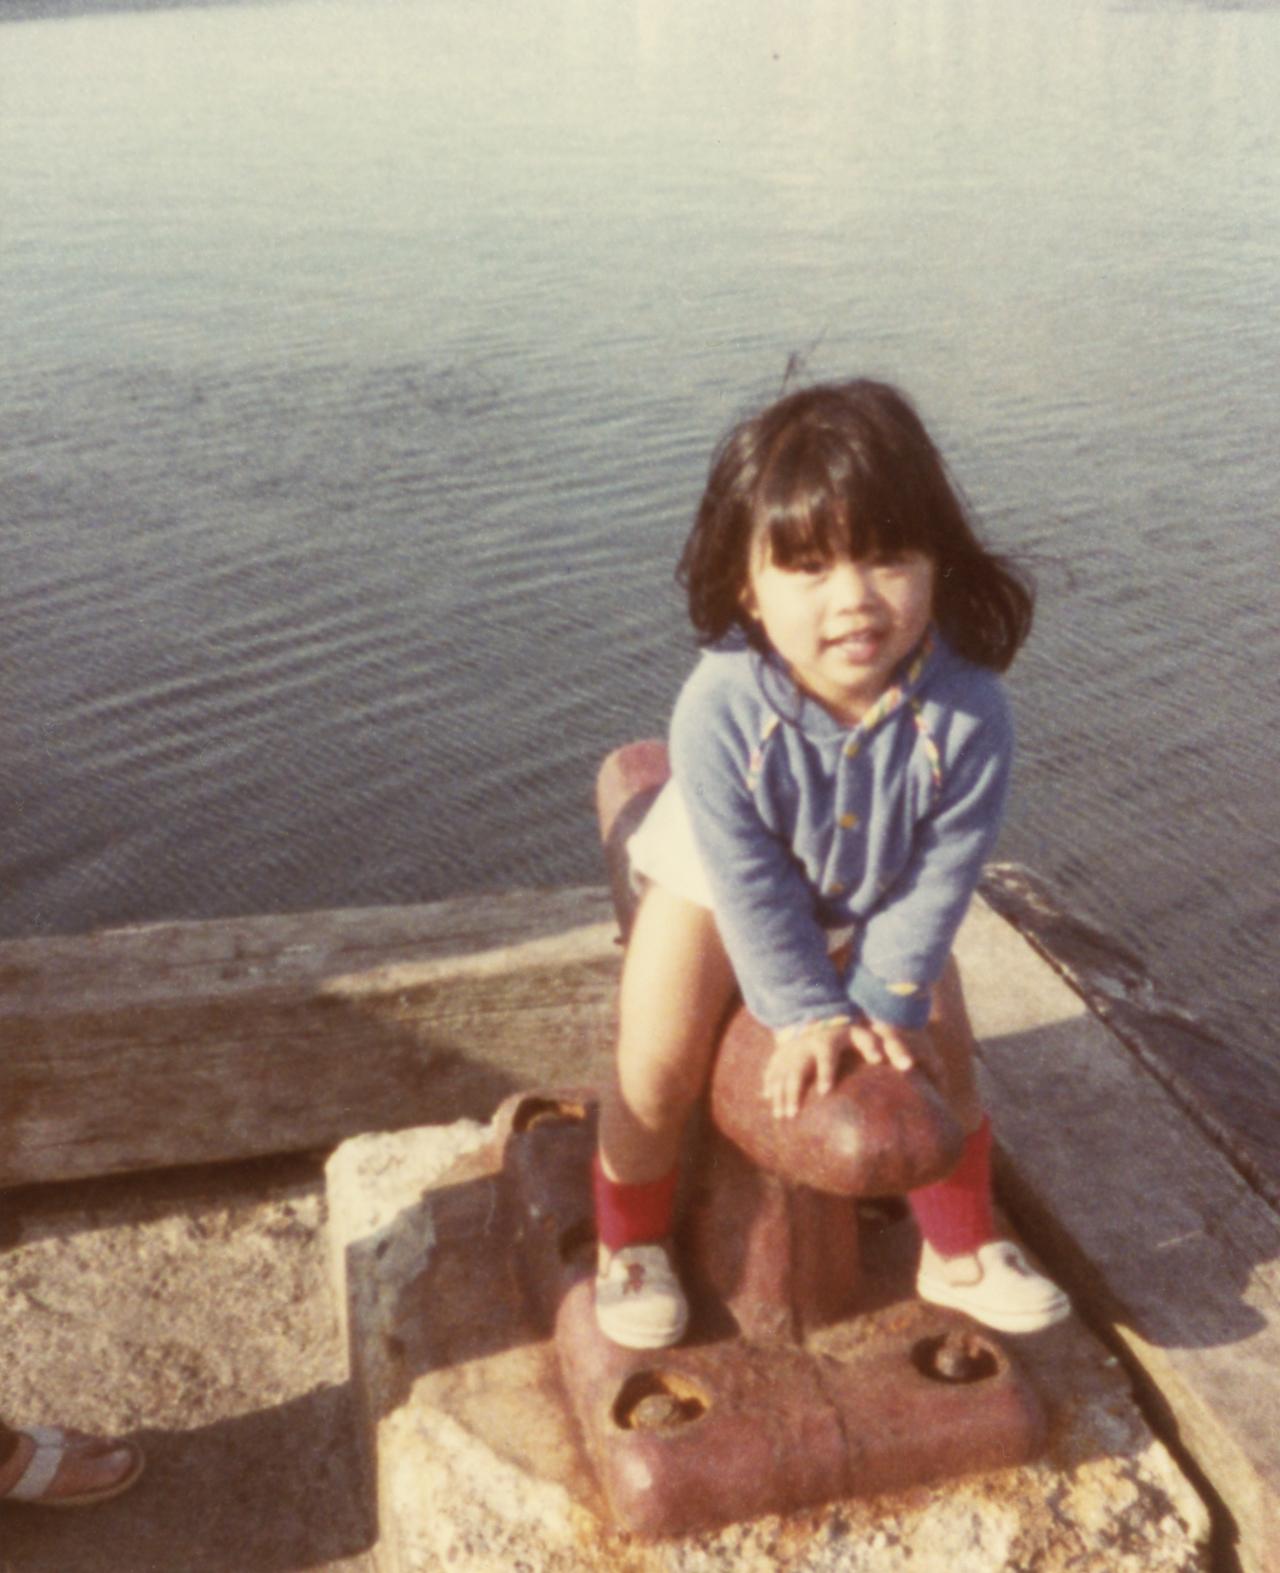 1980s color amateur snapshot, original.jpg